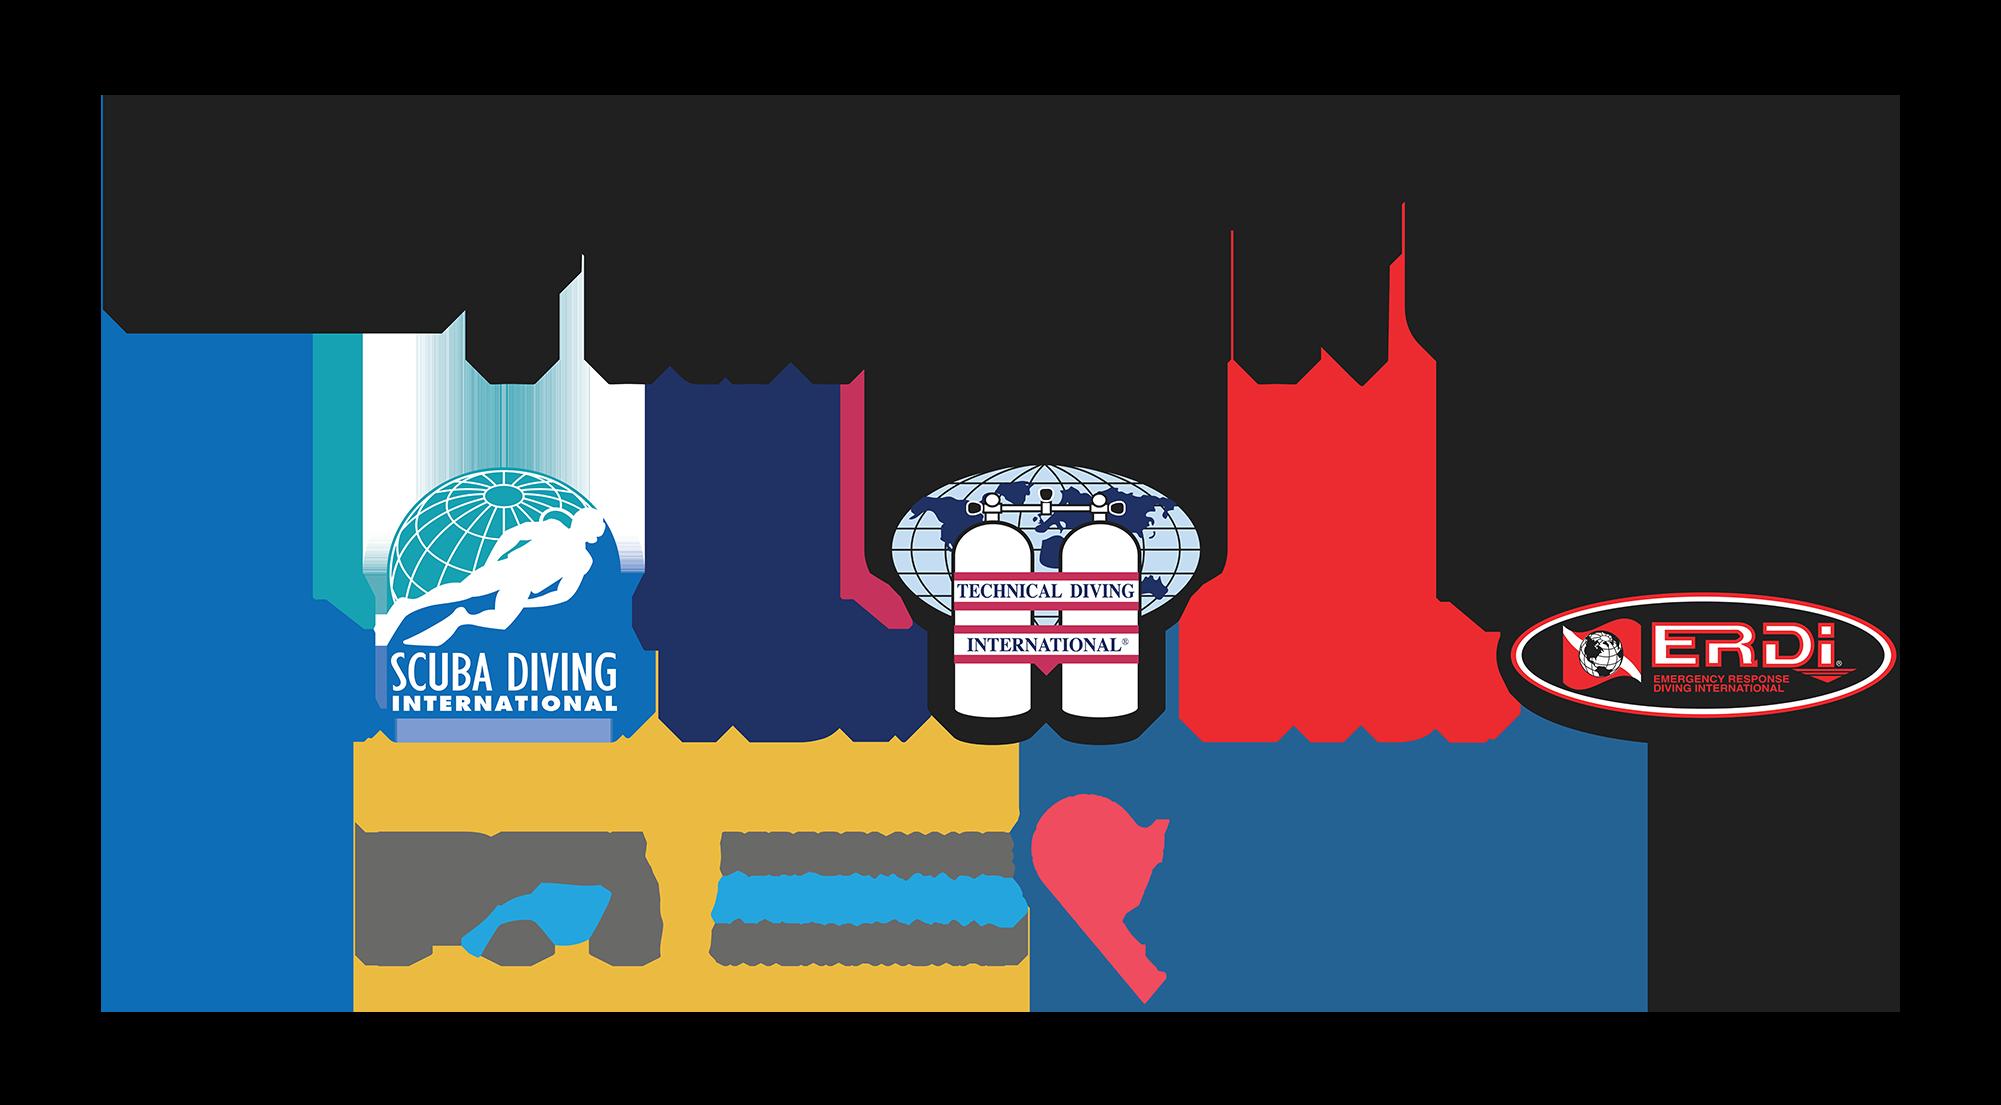 International Training All Logos Transparent